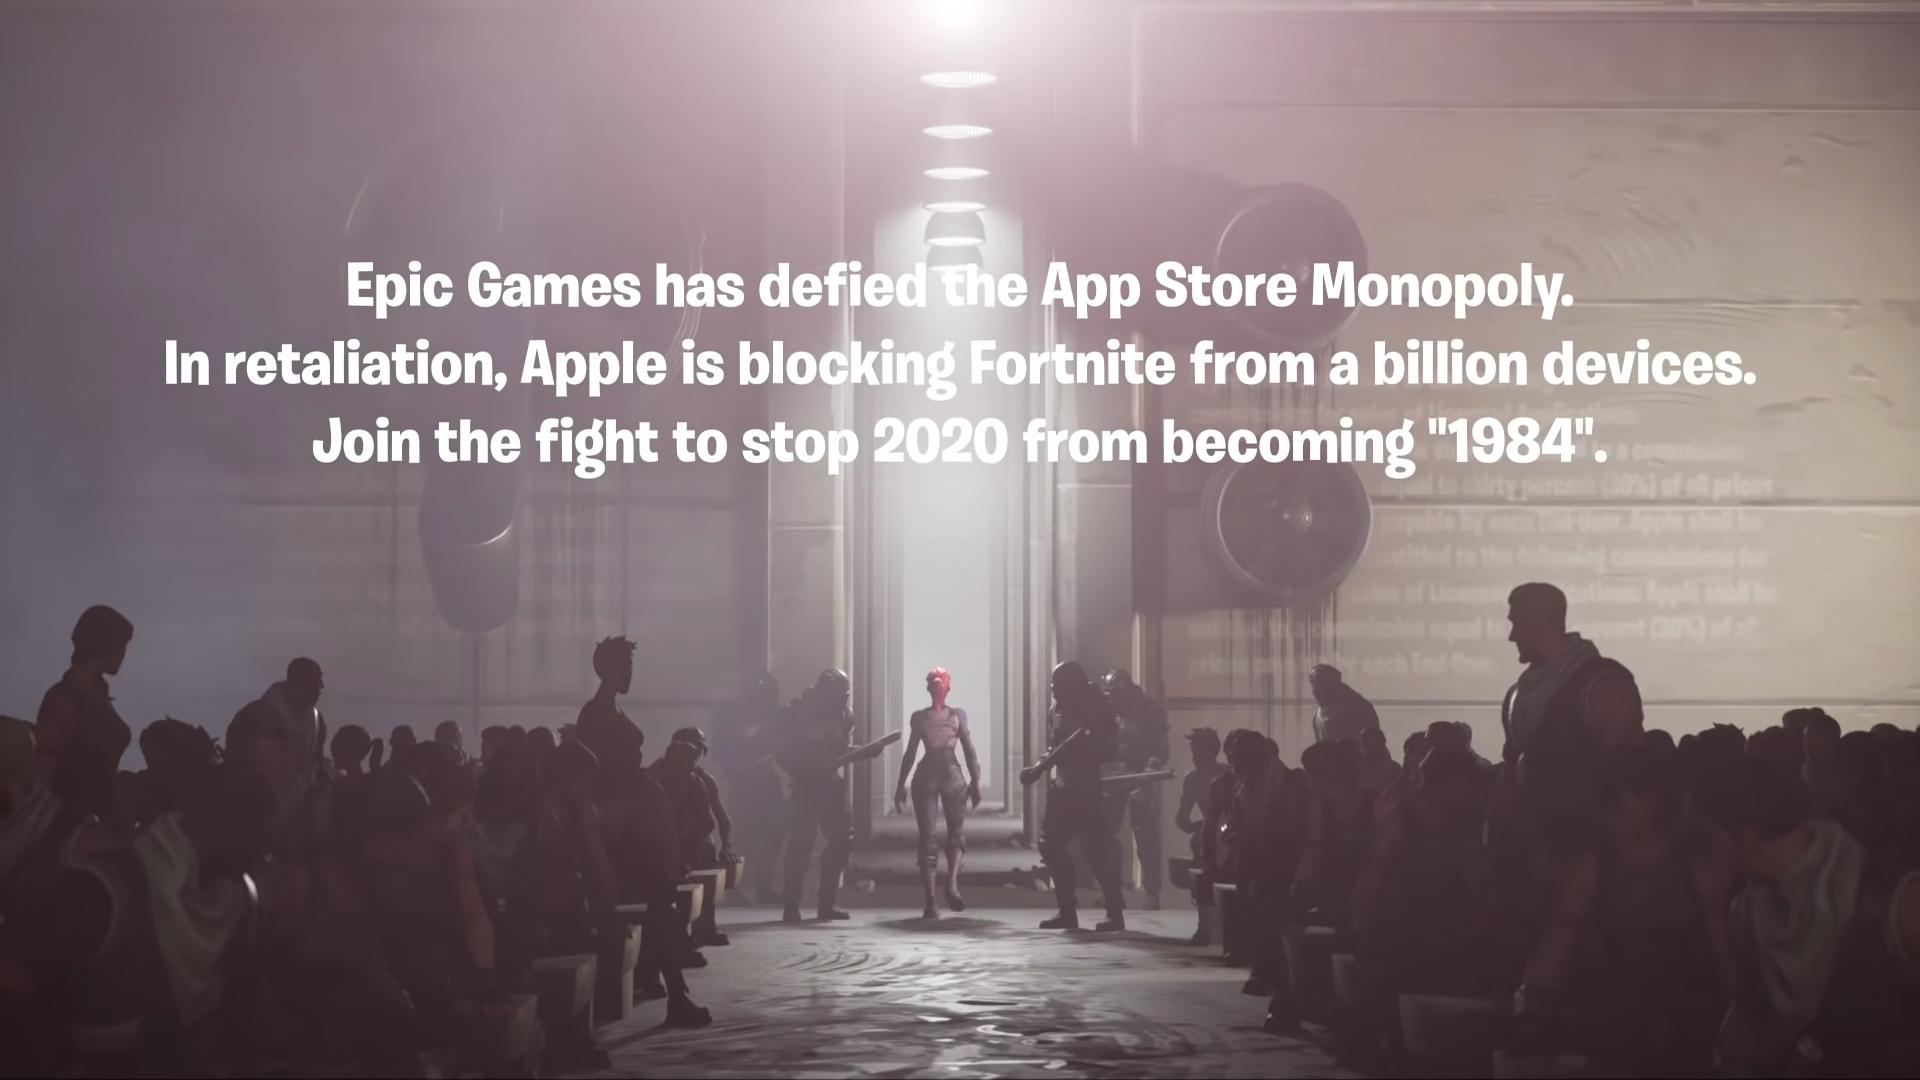 Epic Games' #FreeFortnite video.